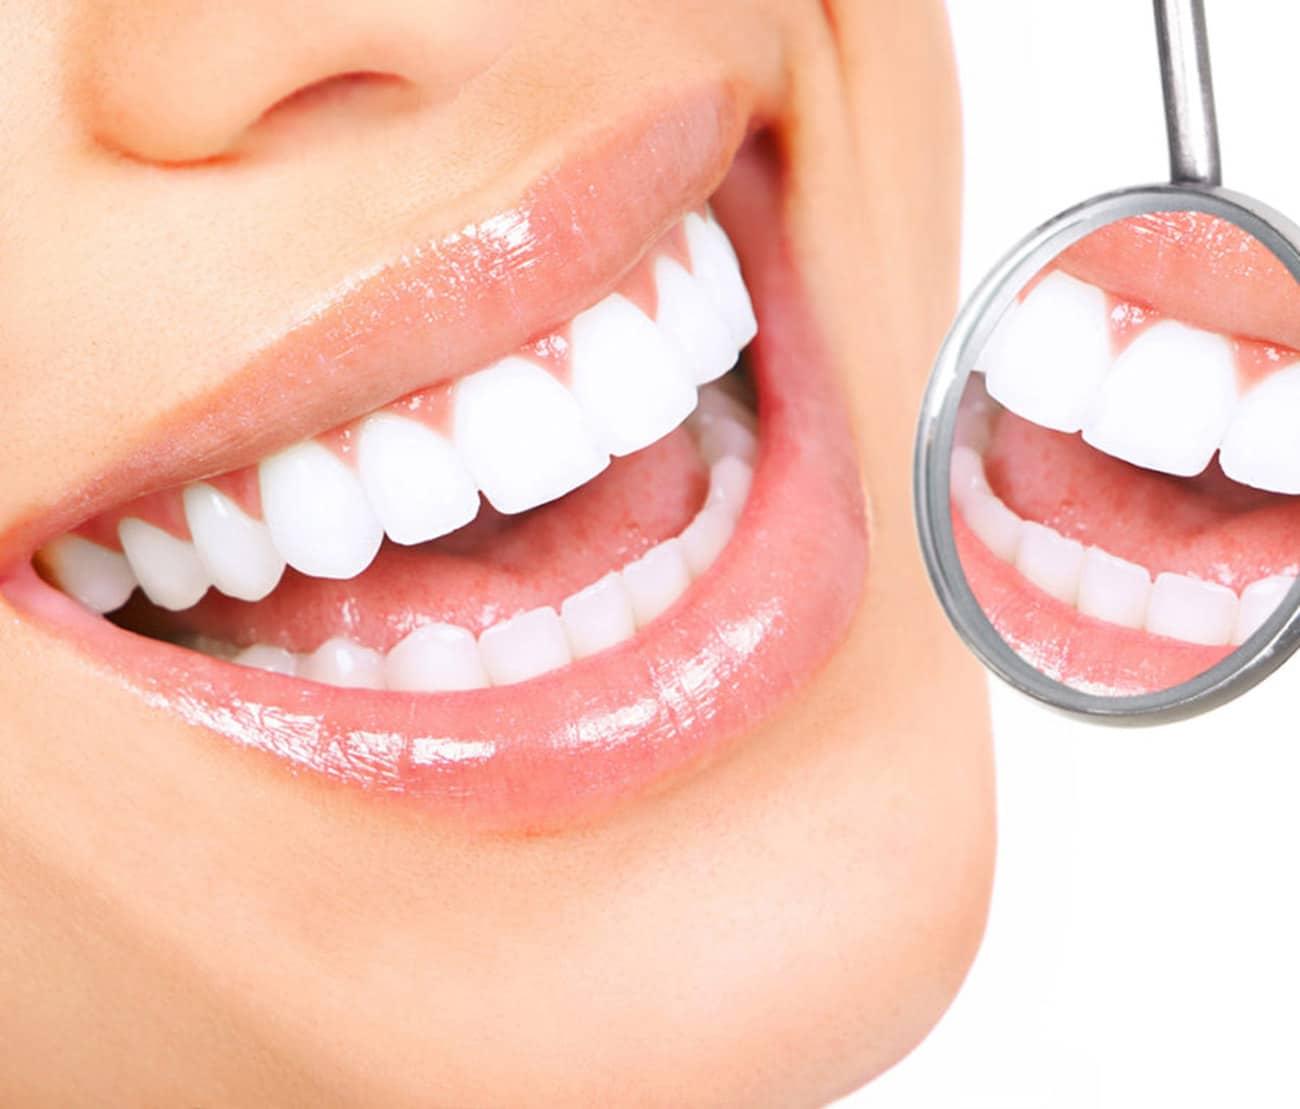 Dentus perfectus - izbjeljivanje zubi